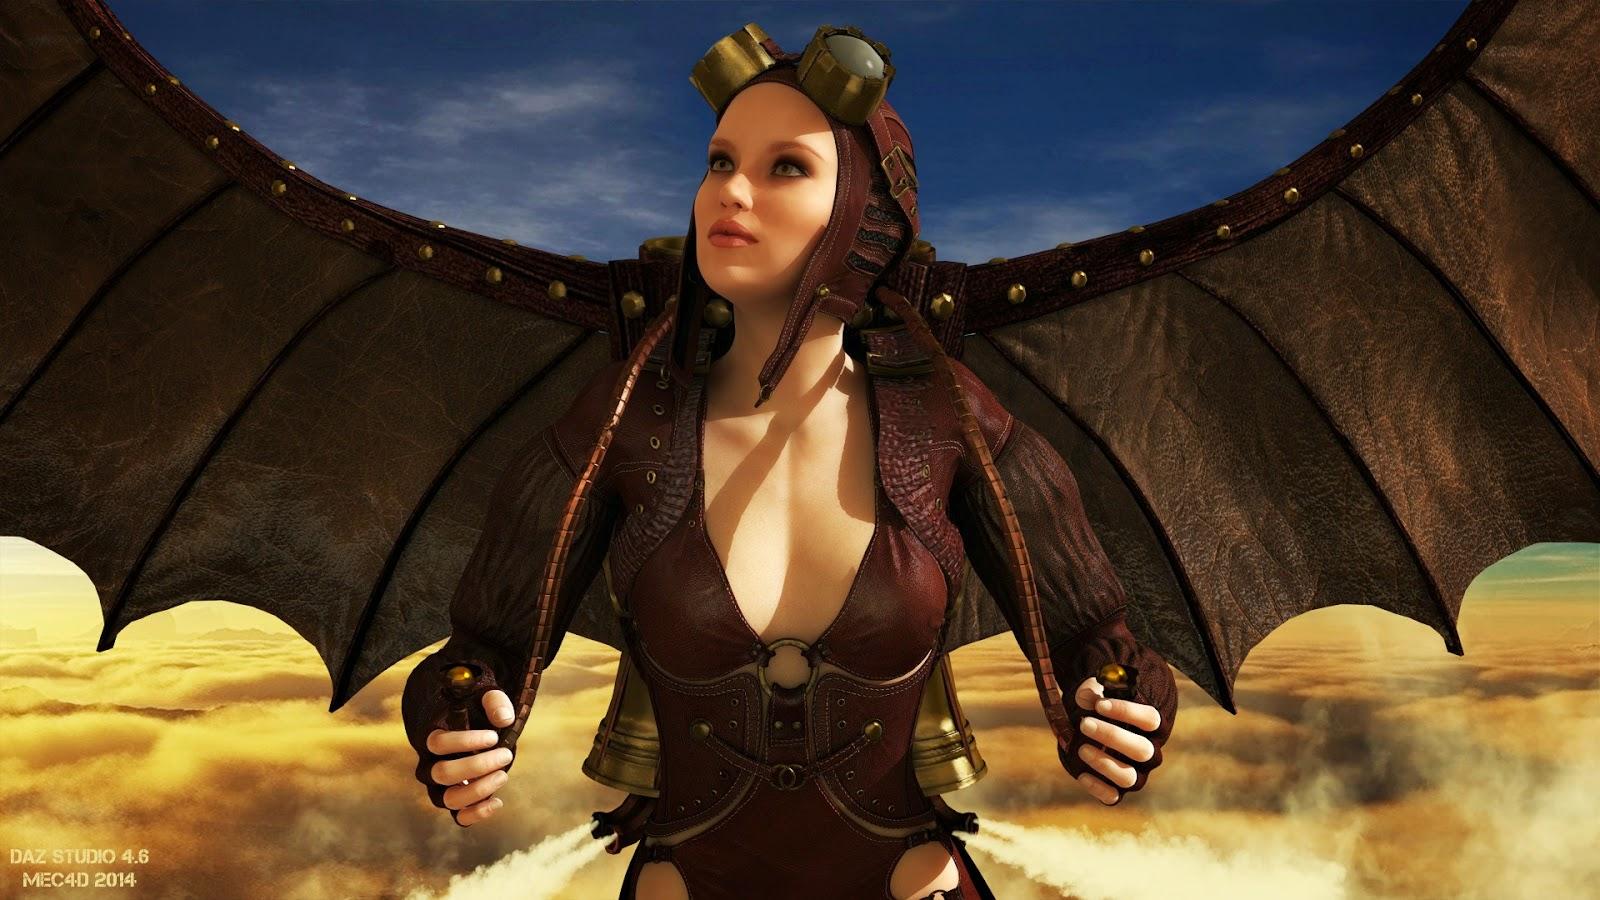 3d Models - The Aviatrix for Genesis 2 Female(s)